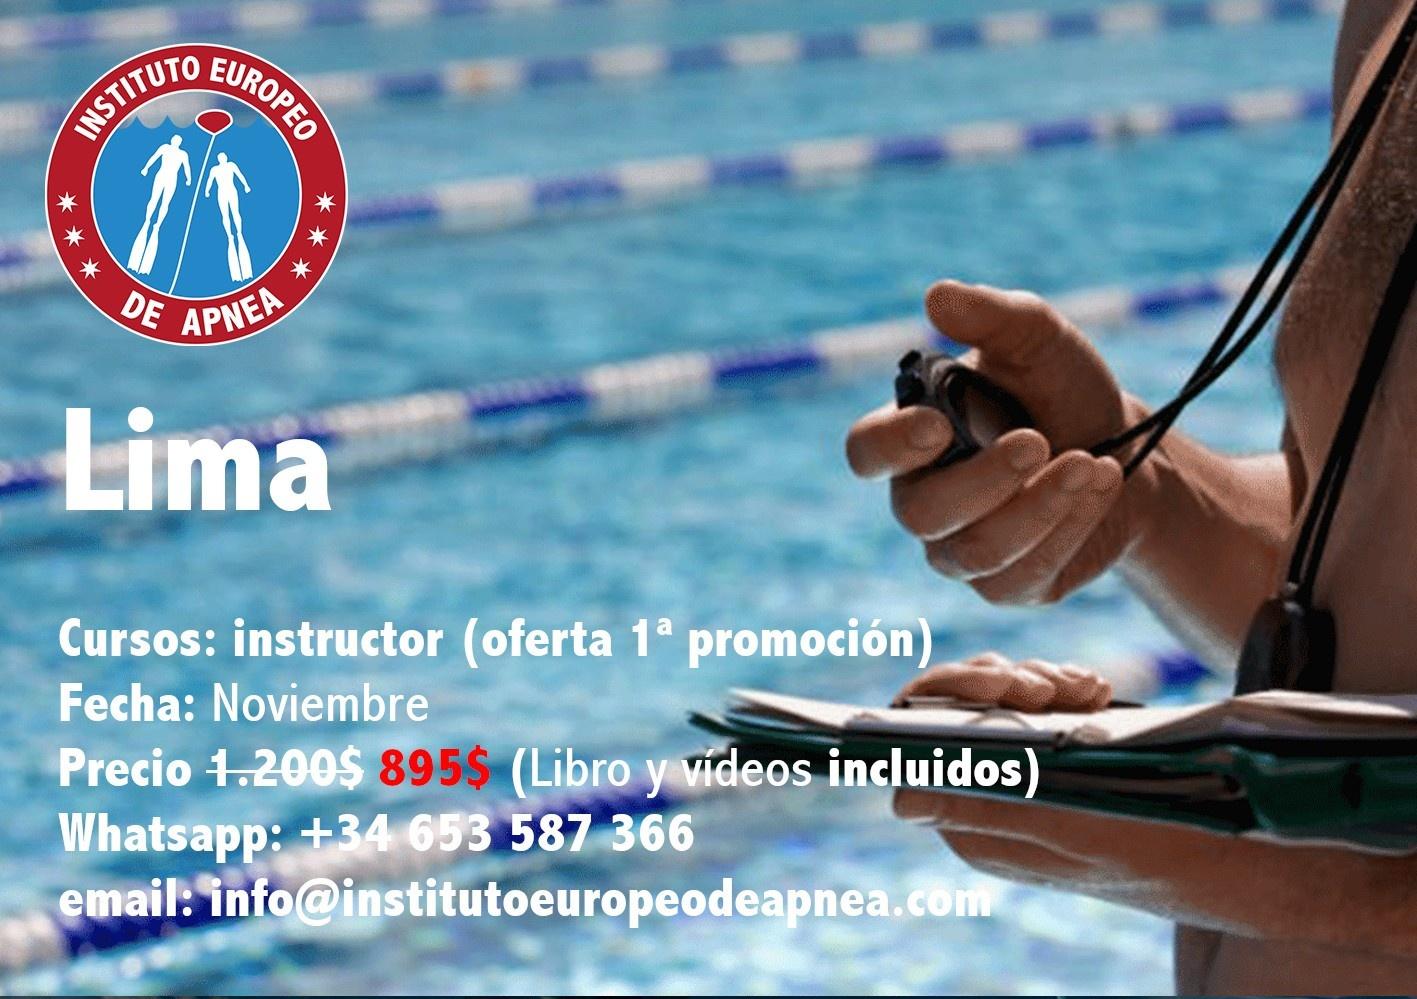 Curso de instructor de apnea Lima - Perú